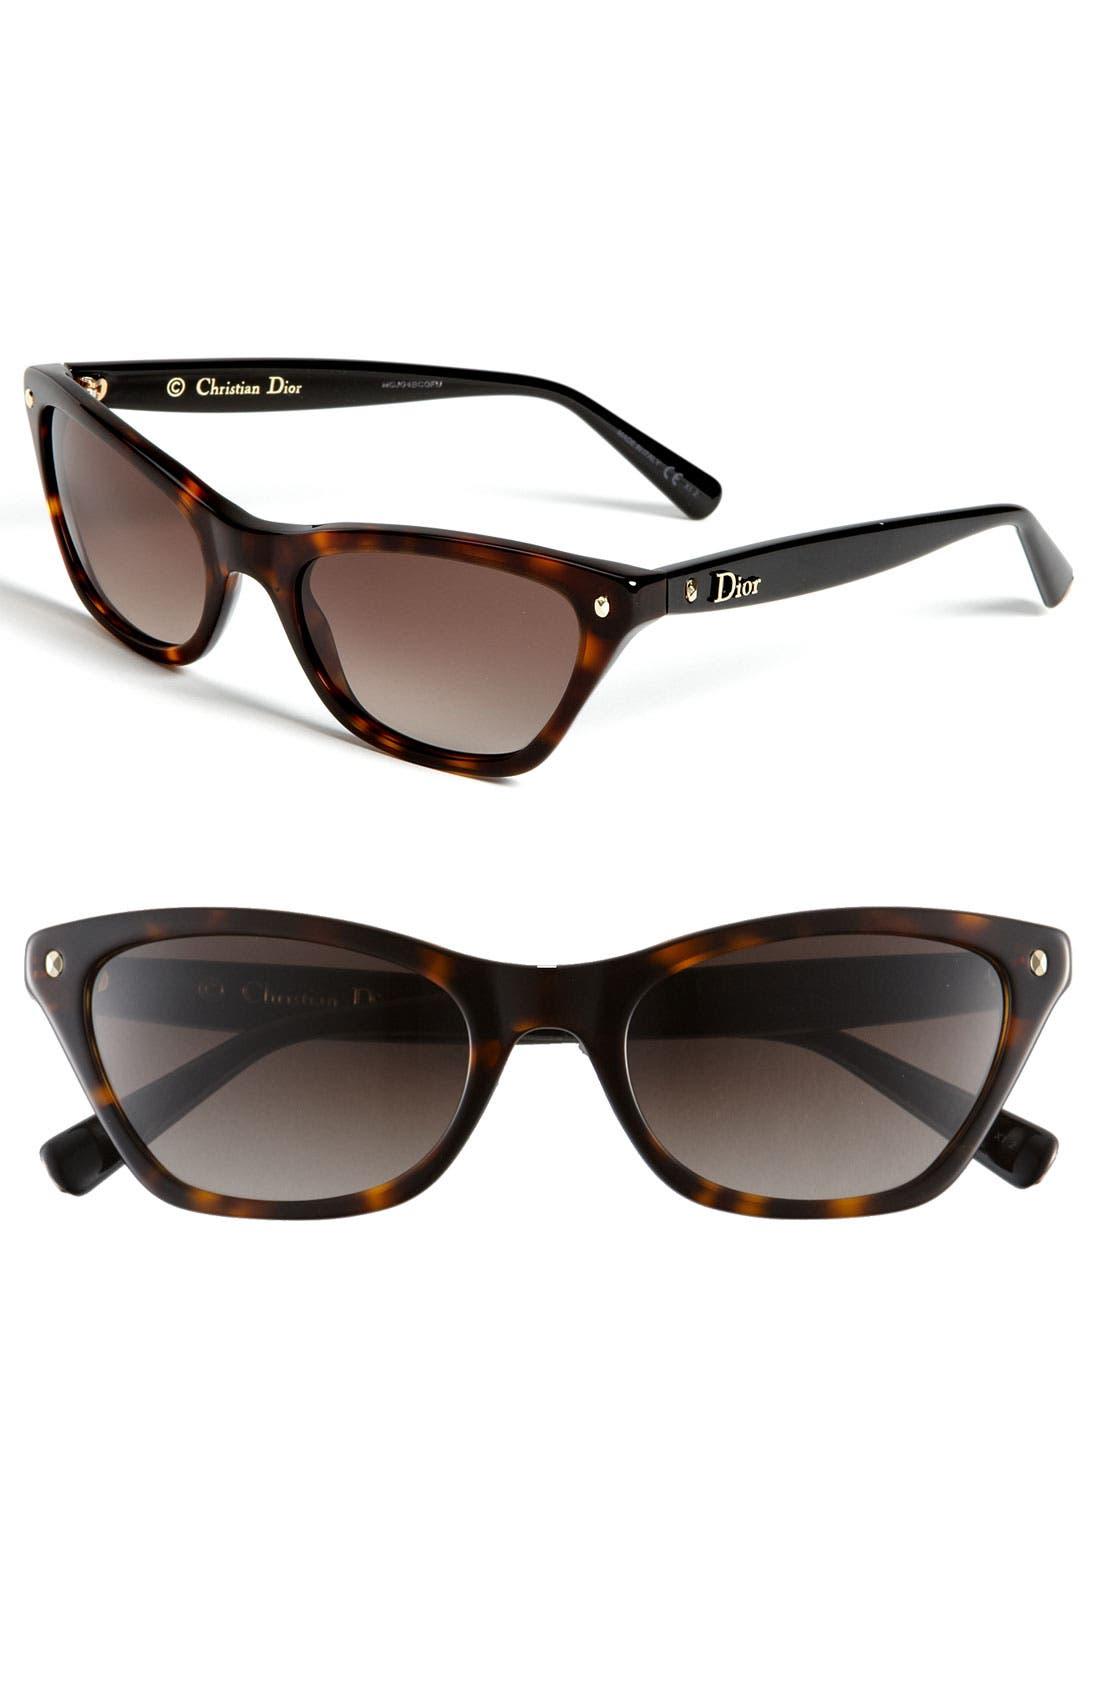 Main Image - Dior 'Hatutaa' Sunglasses